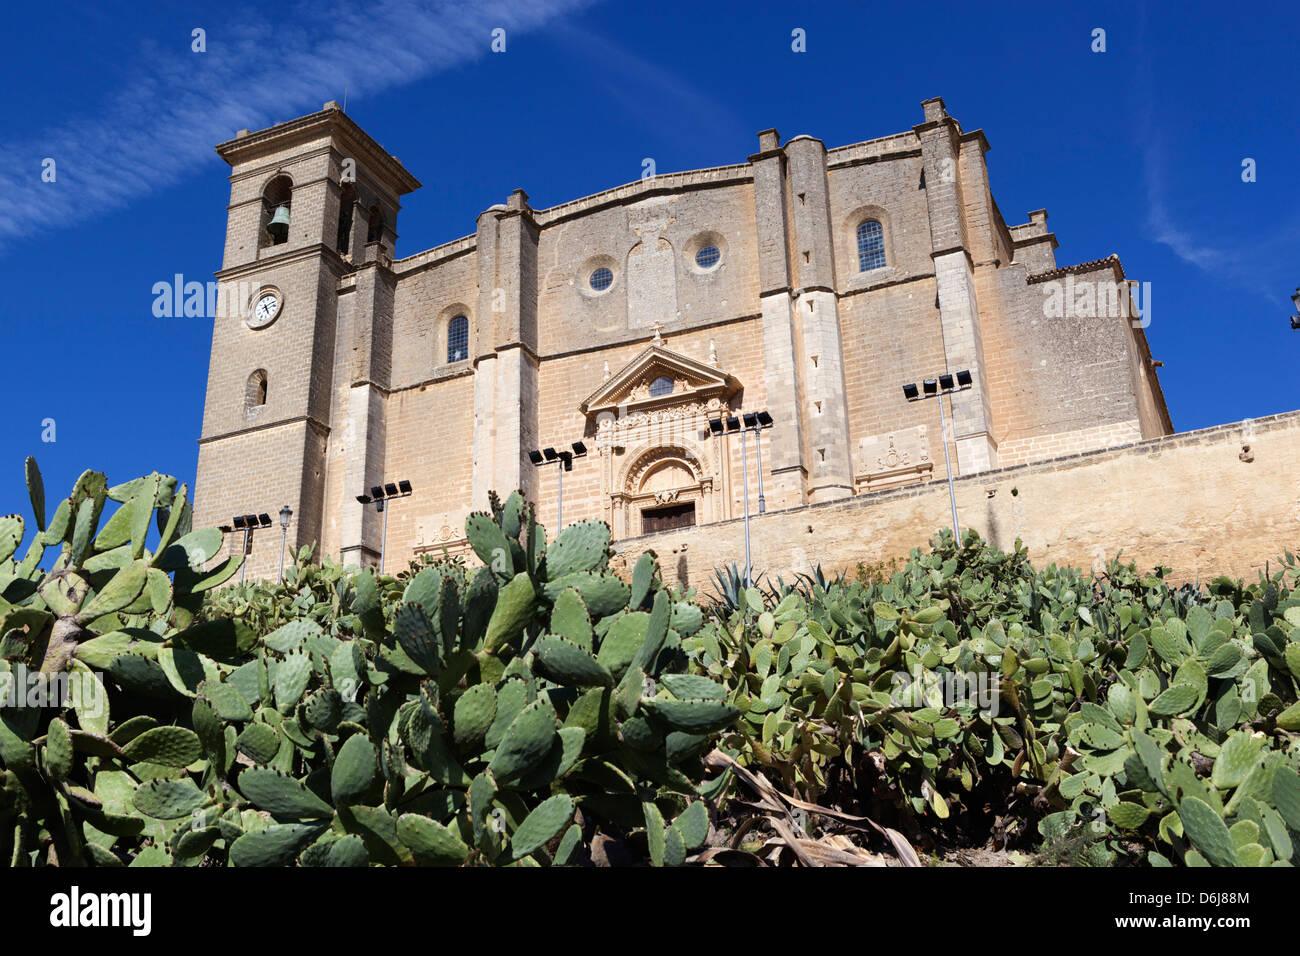 La Colegiata, the 16th century Renaissance church, Osuna, Andalucia, Spain, Europe - Stock Image